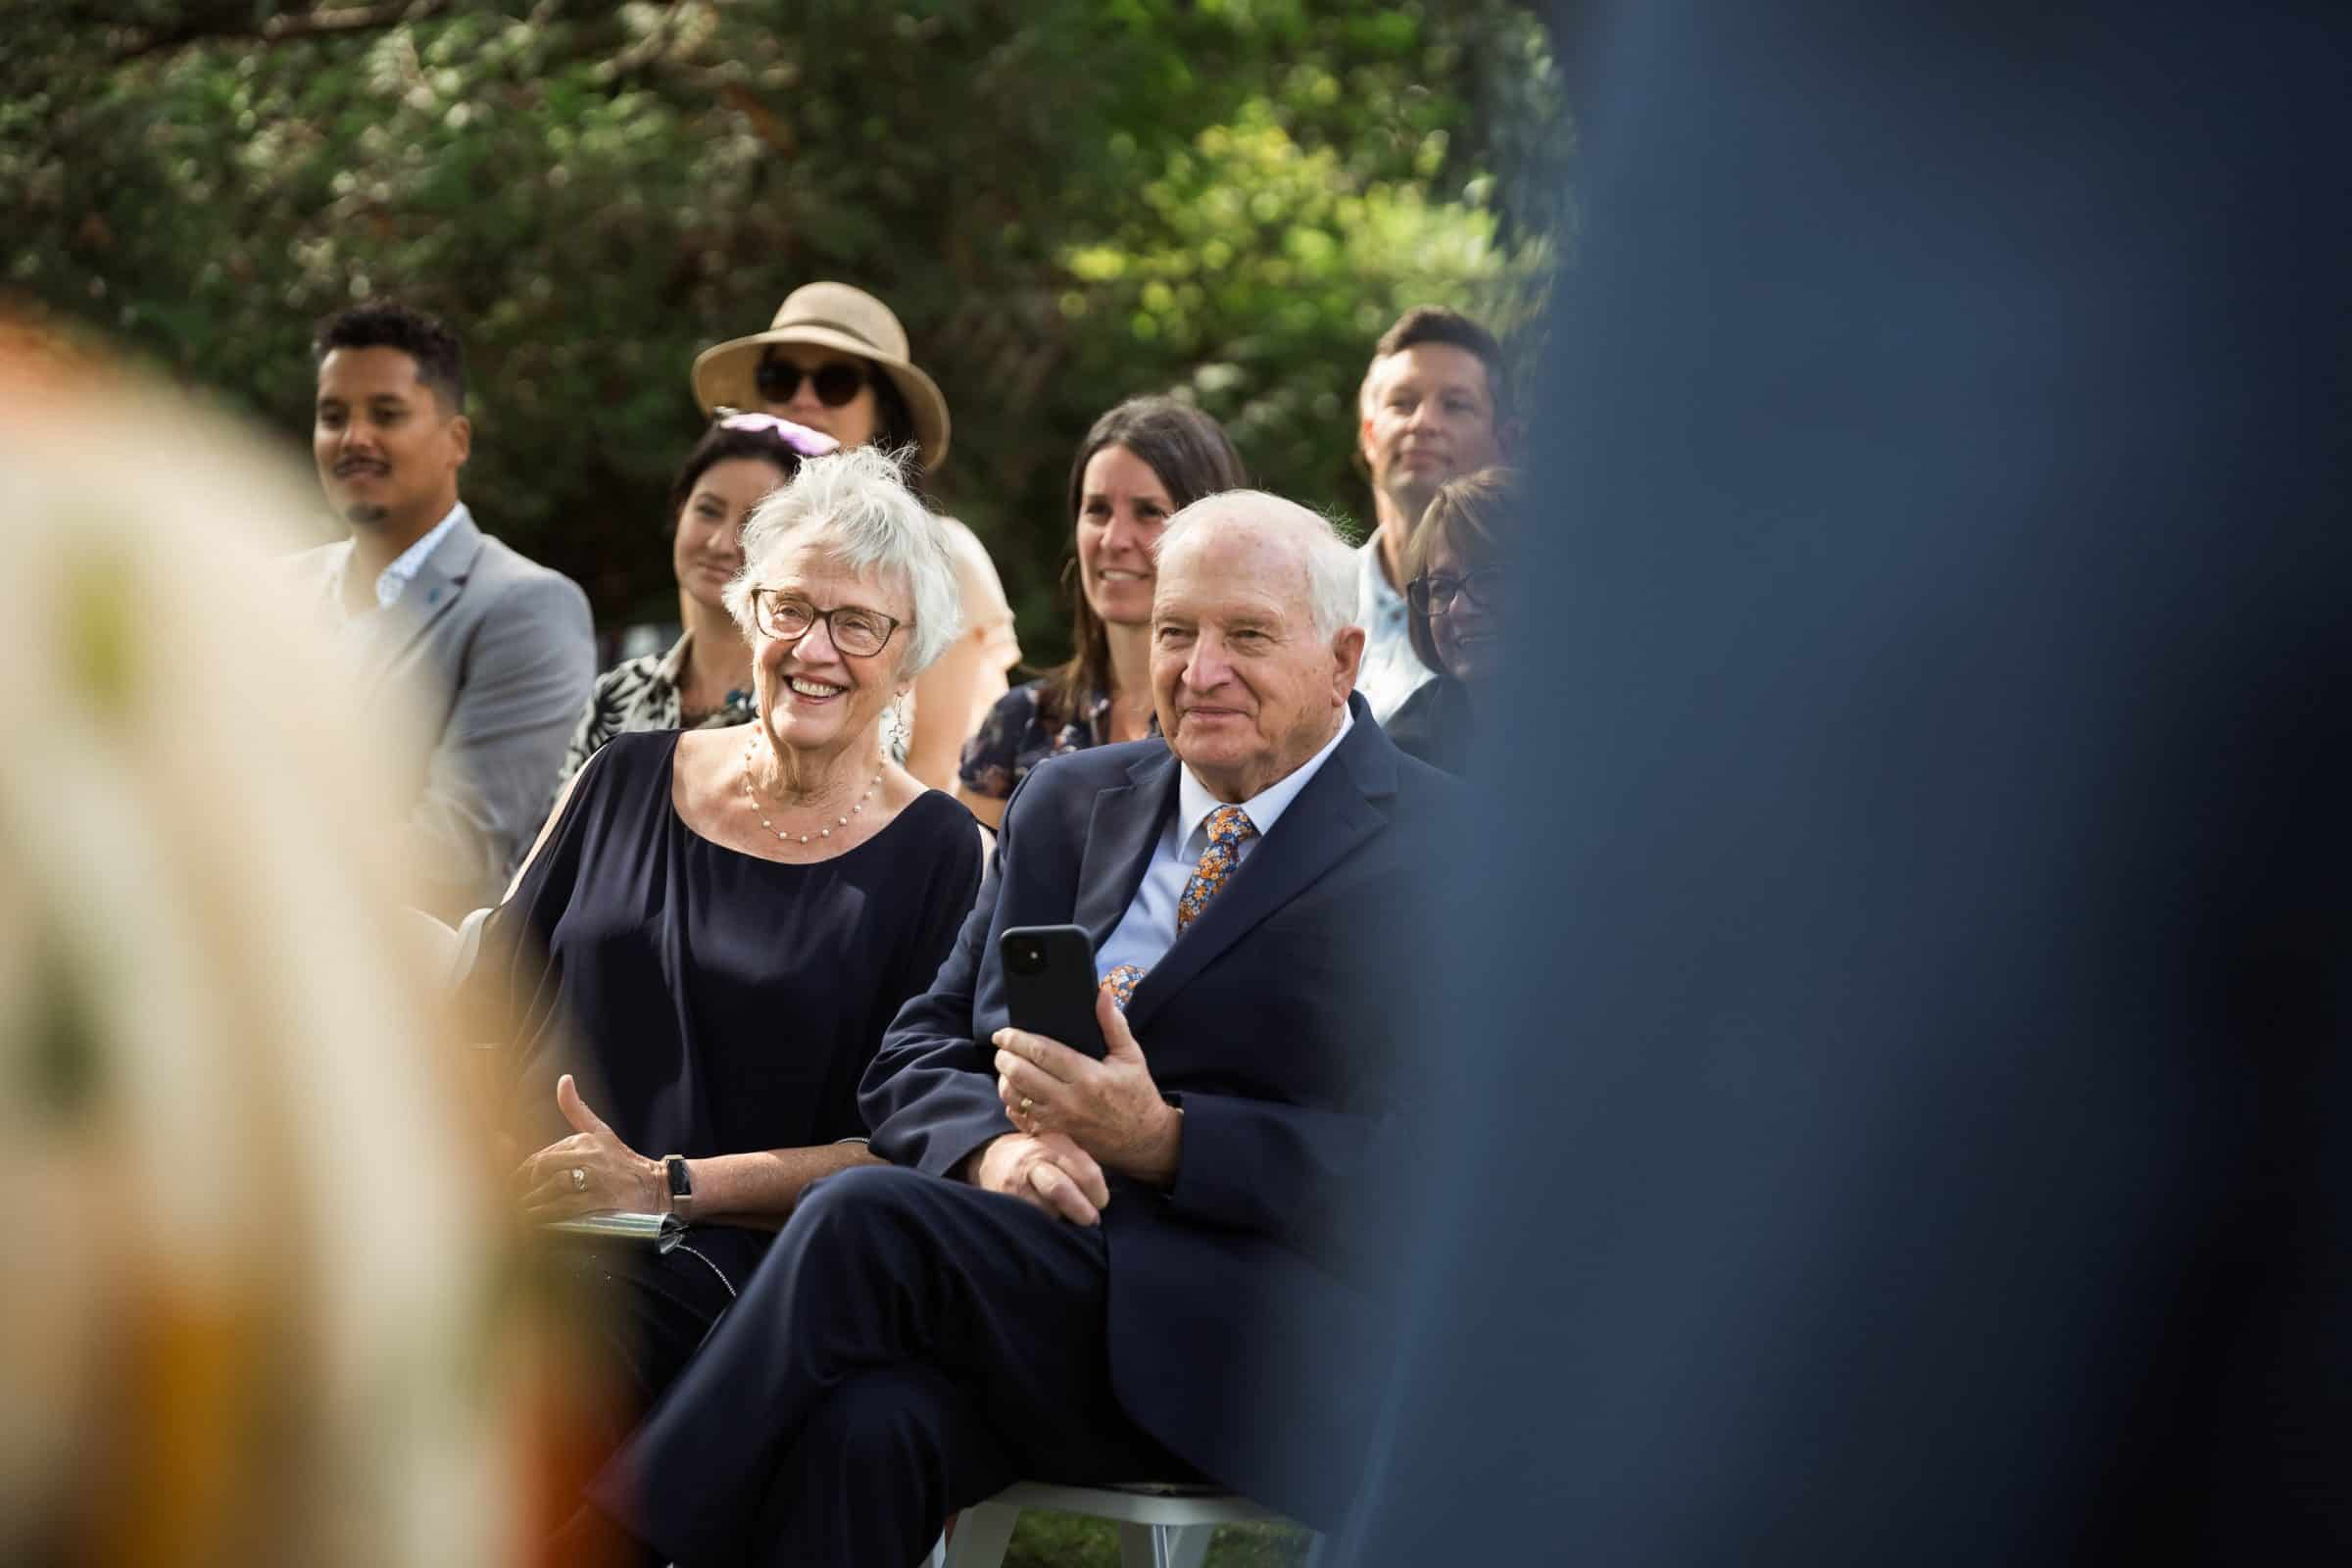 close up of parents at wedding smiling